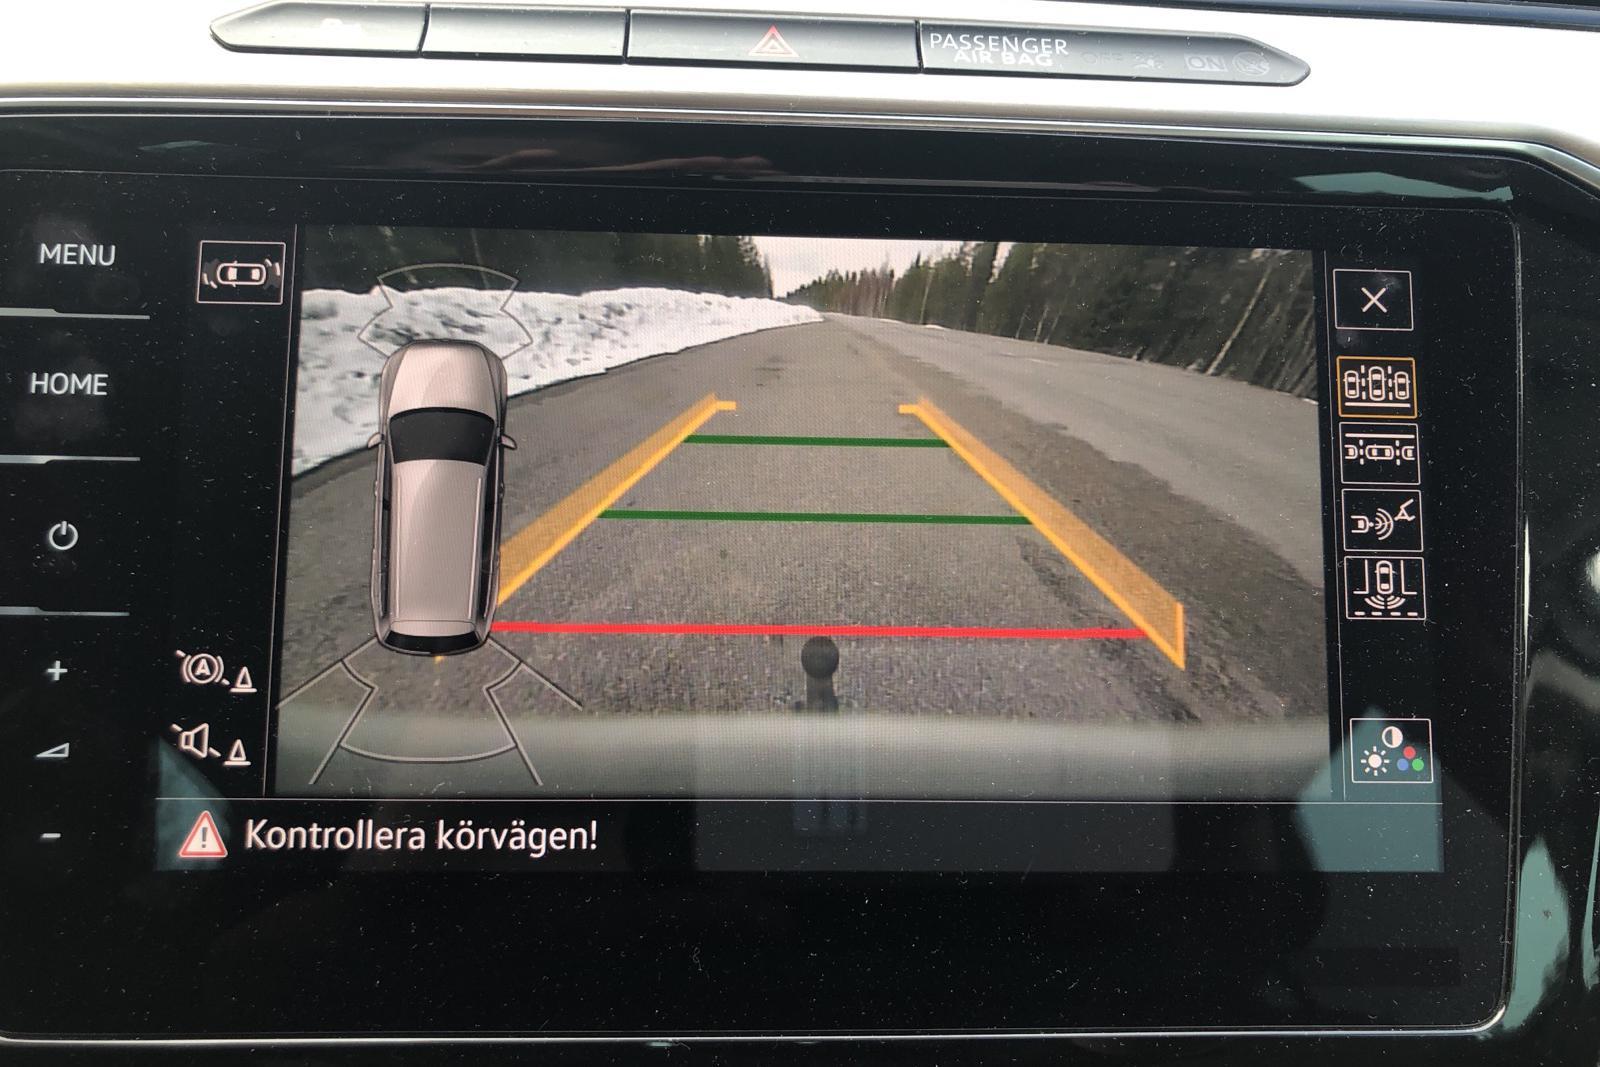 VW Passat Alltrack 2.0 TDI Sportscombi 4MOTION (190hk) - 8 236 mil - Automat - vit - 2018